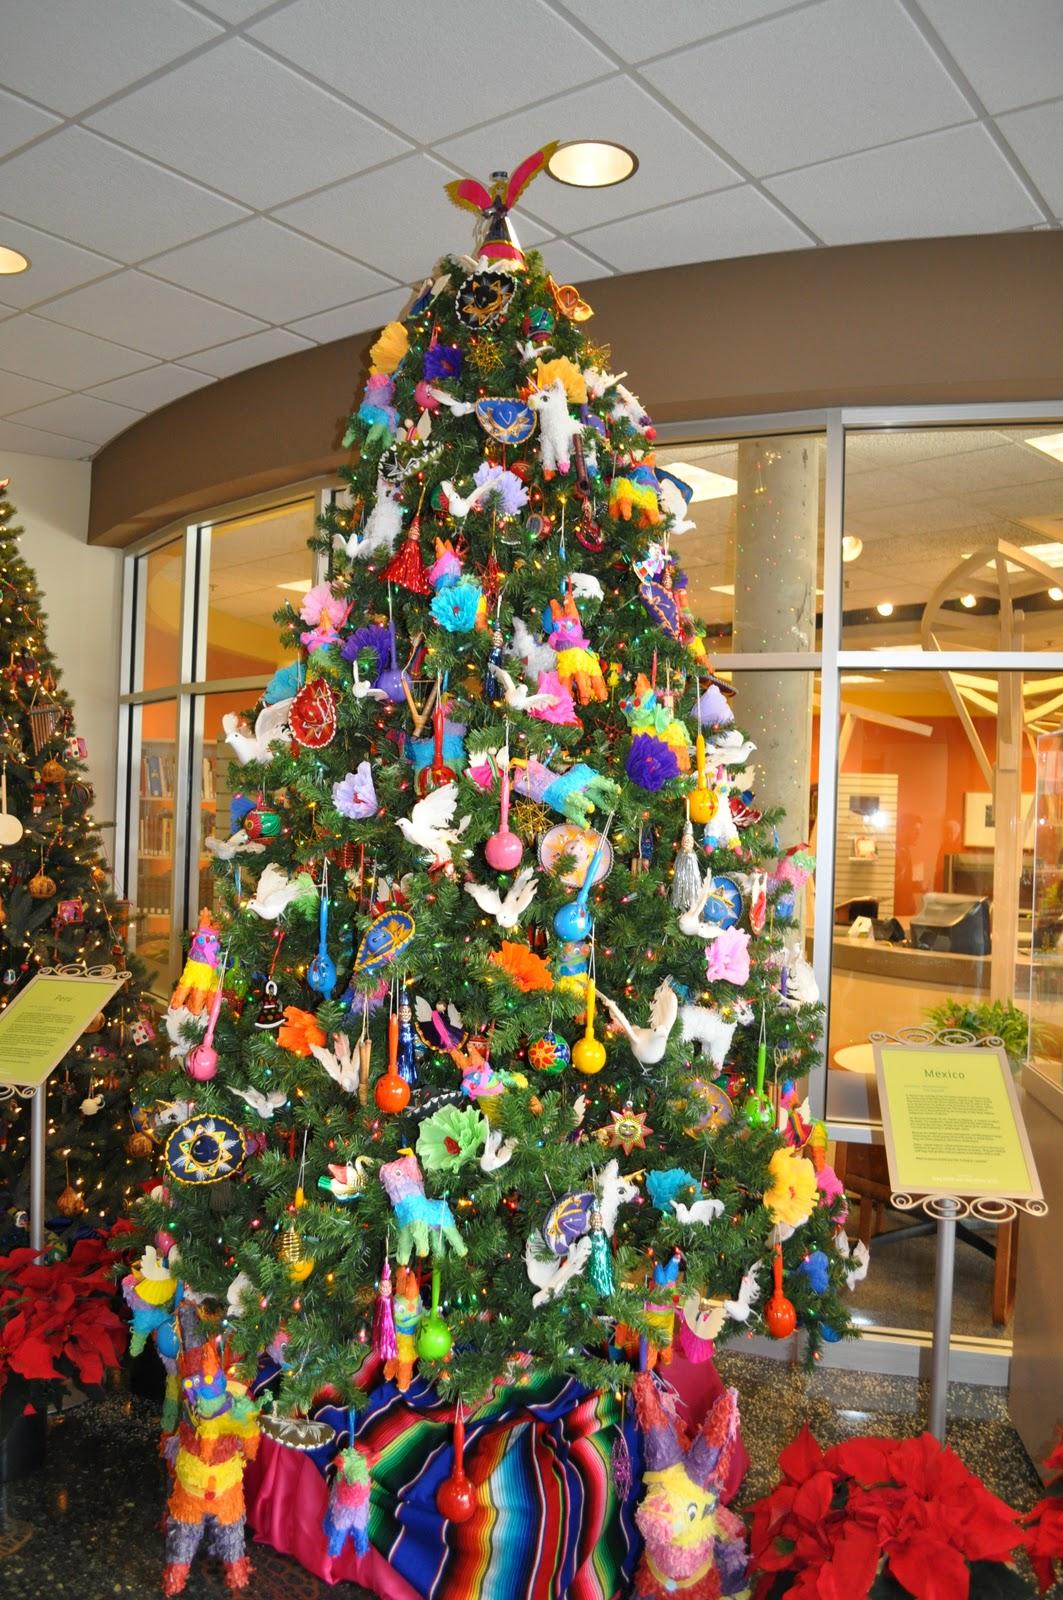 Michigan Cottage Cook: CHRISTMAS AROUND THE WORLD ...